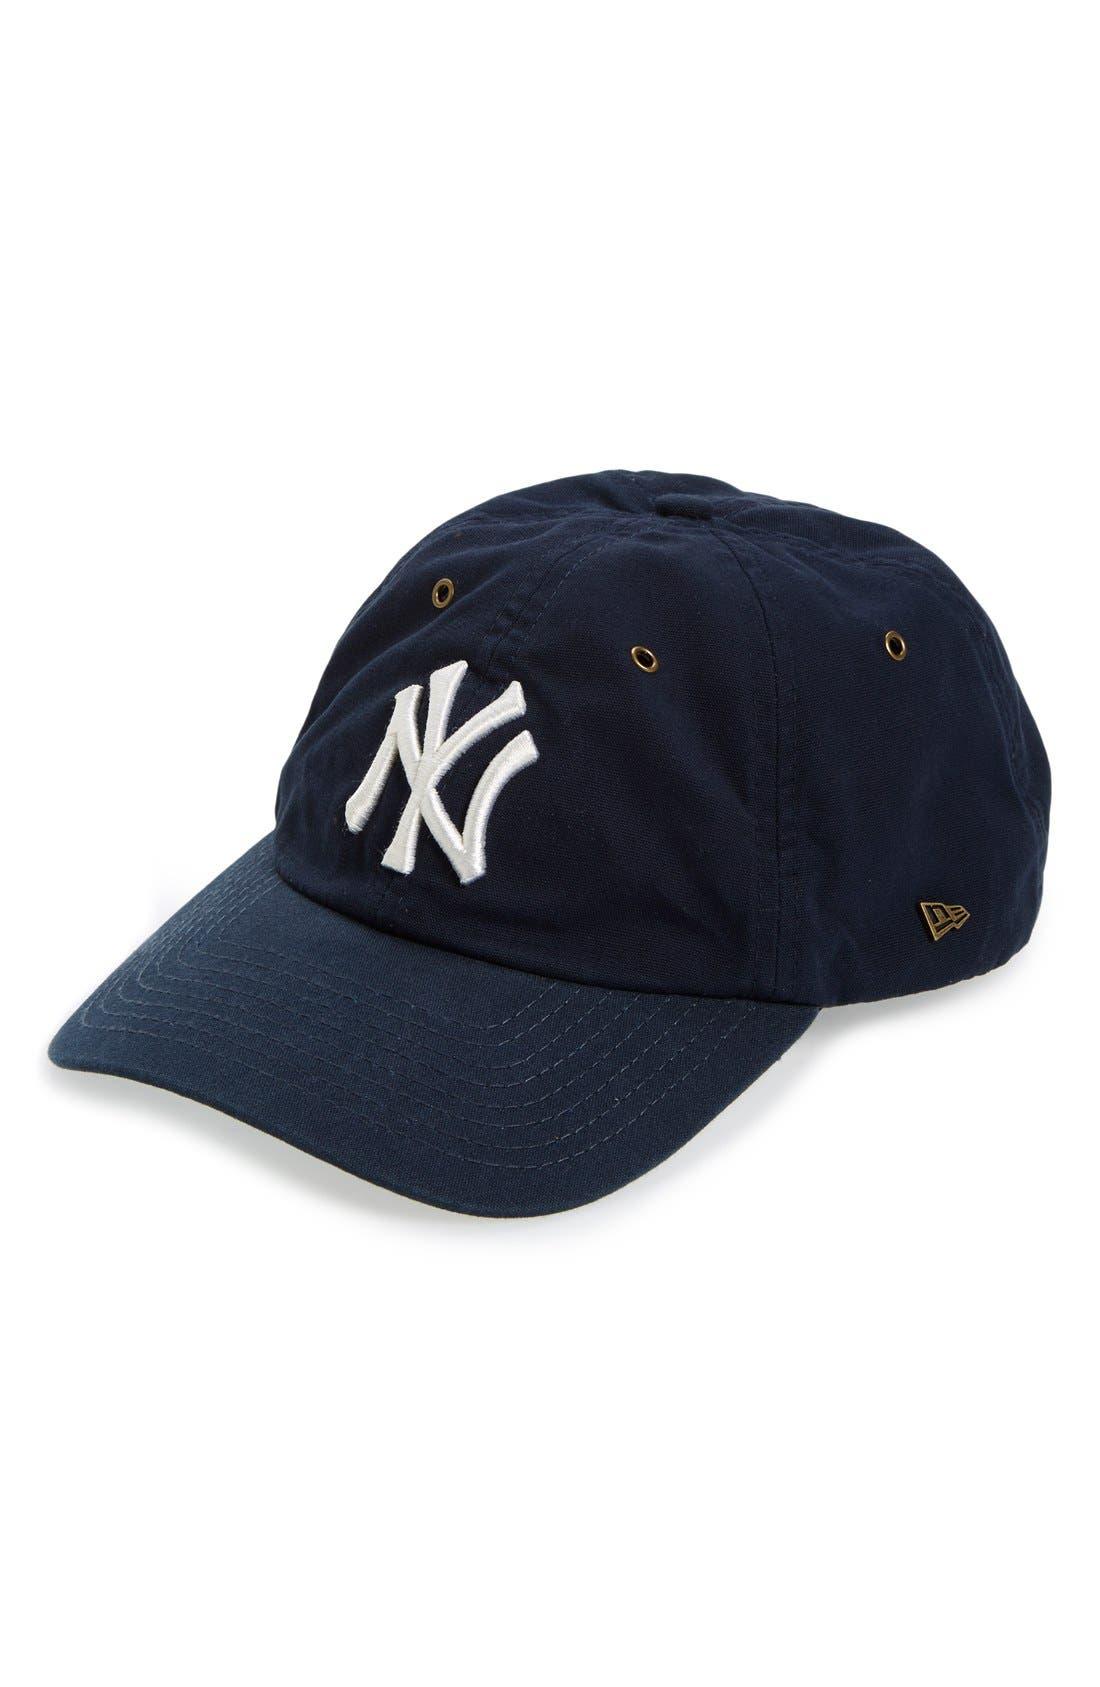 Alternate Image 1 Selected - New Era Cap 'New York Yankees' Baseball Cap